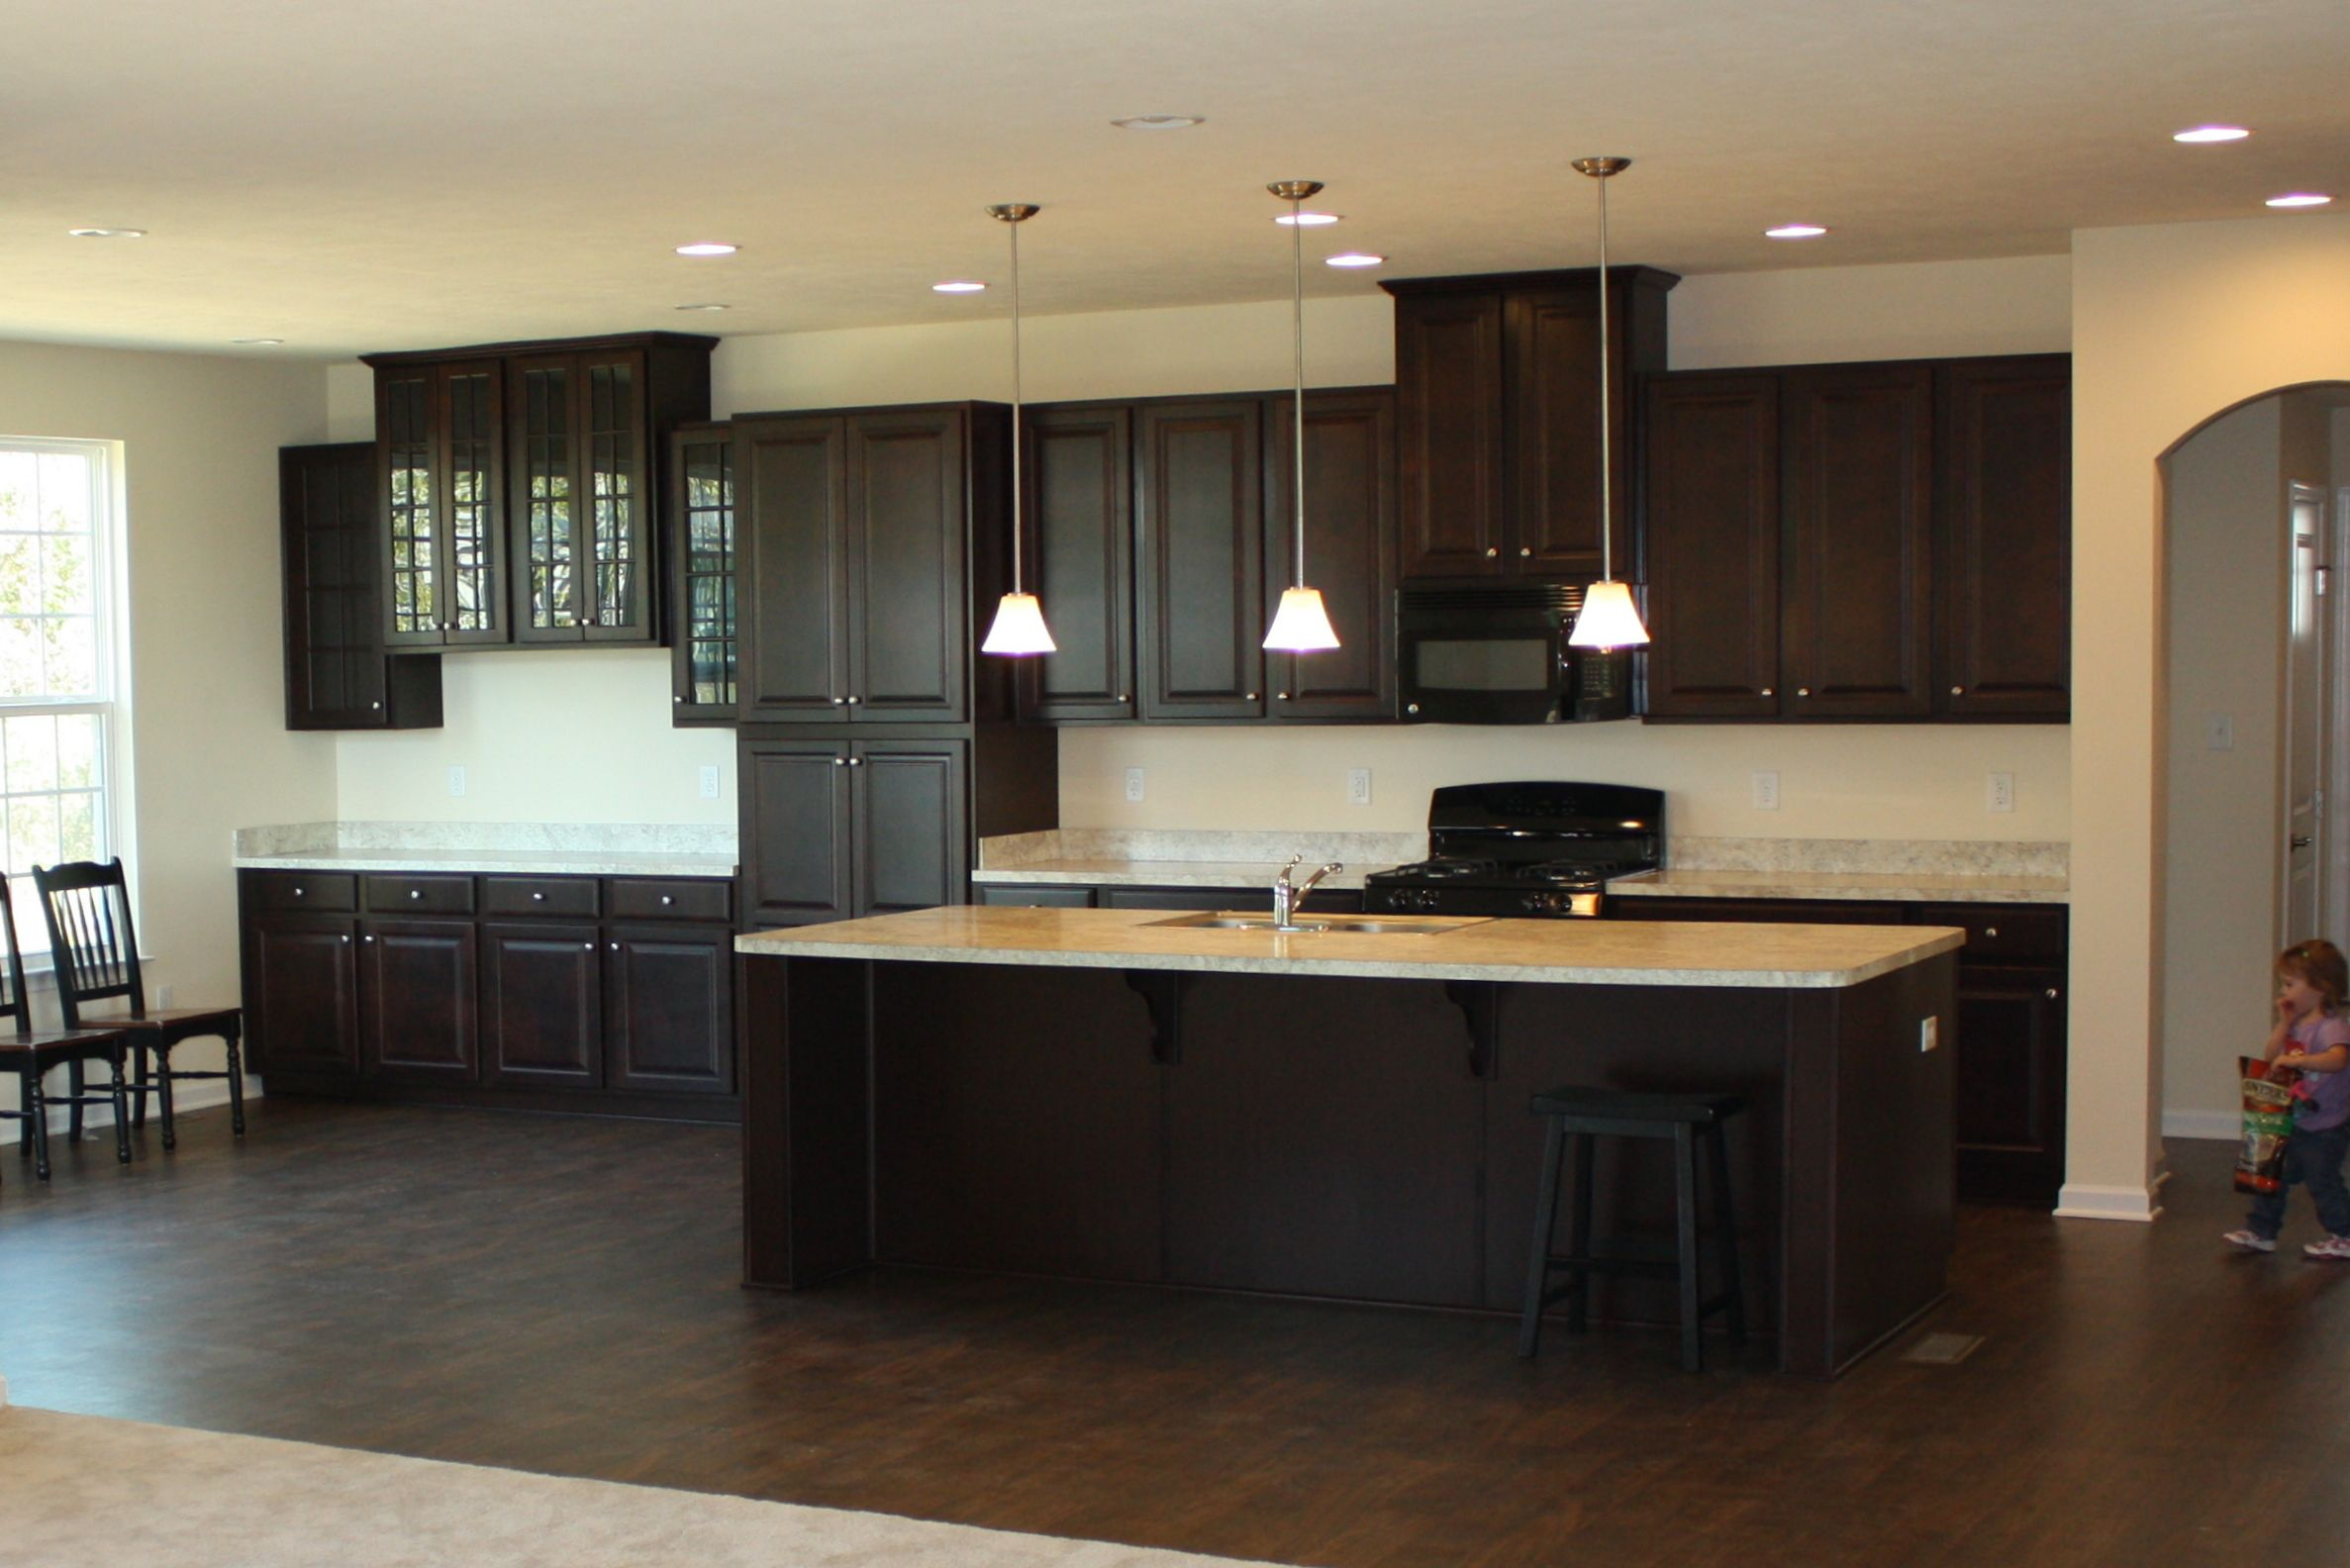 kitchen wyoming cherry java cabinets home renovation kitchen interior kitchen layout on kitchen cabinets java id=76513